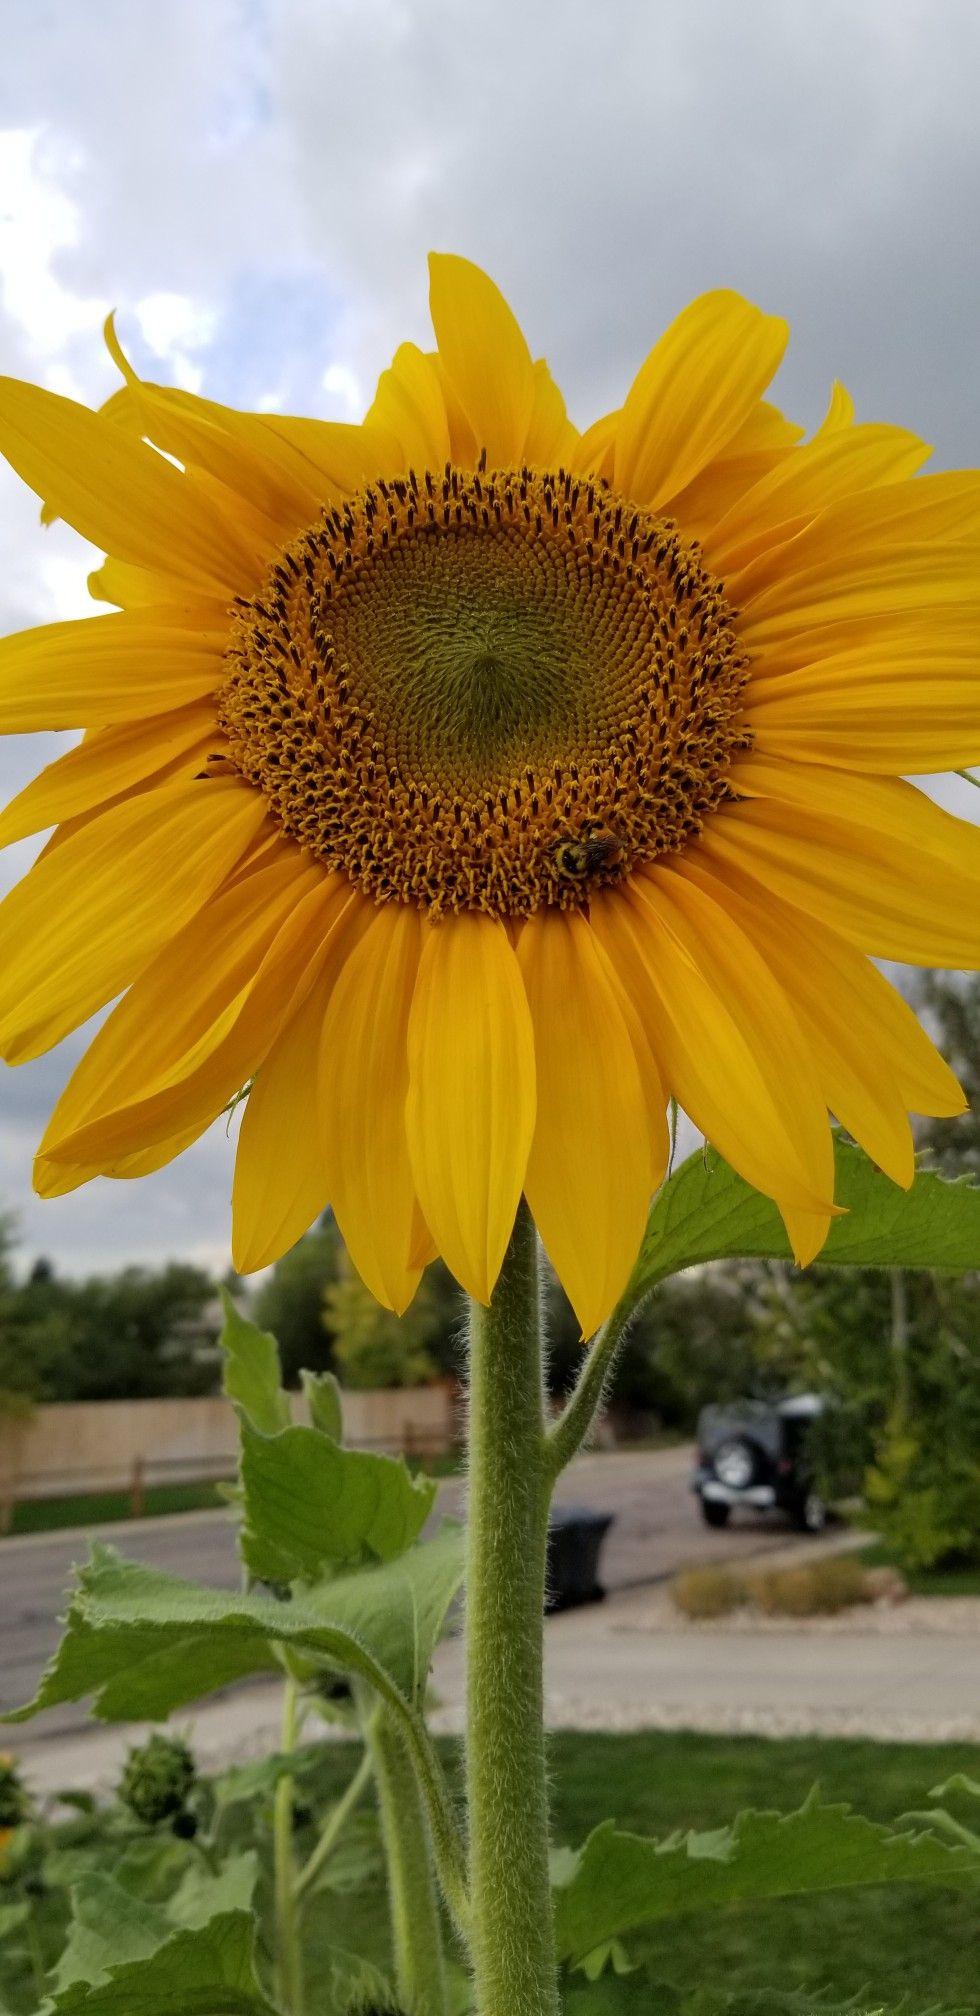 Giant sunflower with bee Giant sunflower, Garden, Bee